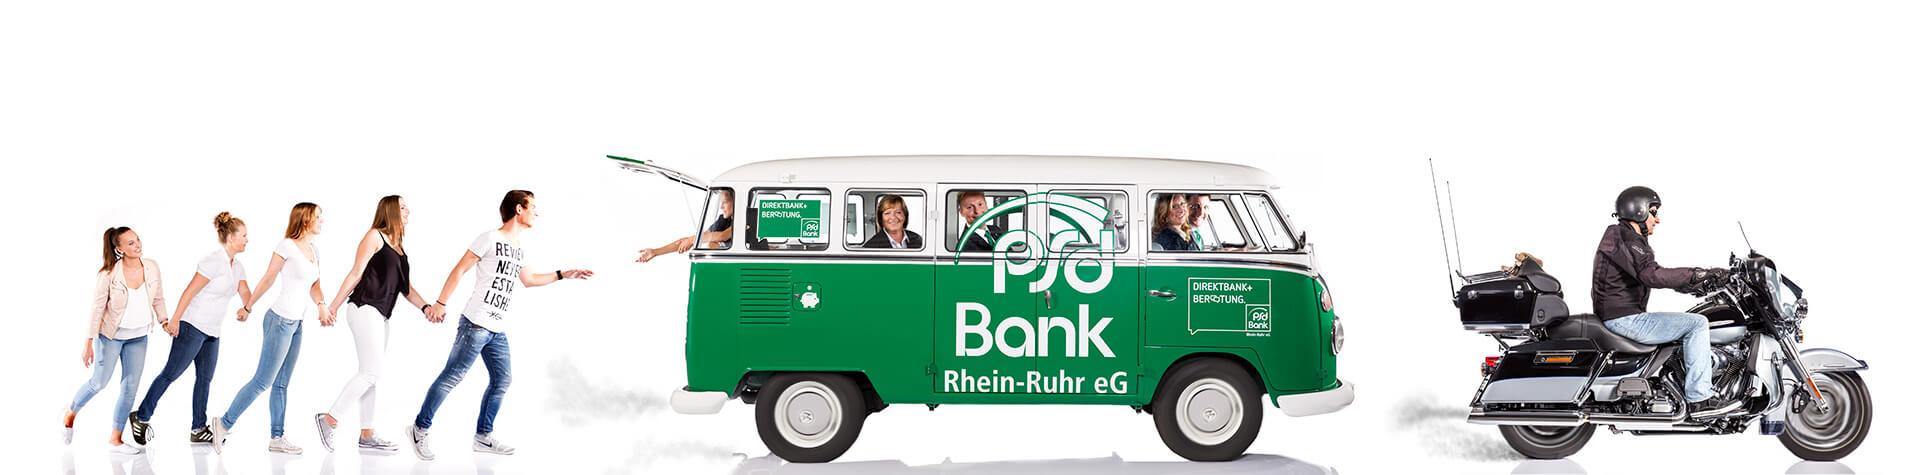 PSD Bank | Falko Wübbecke | Fotodesign